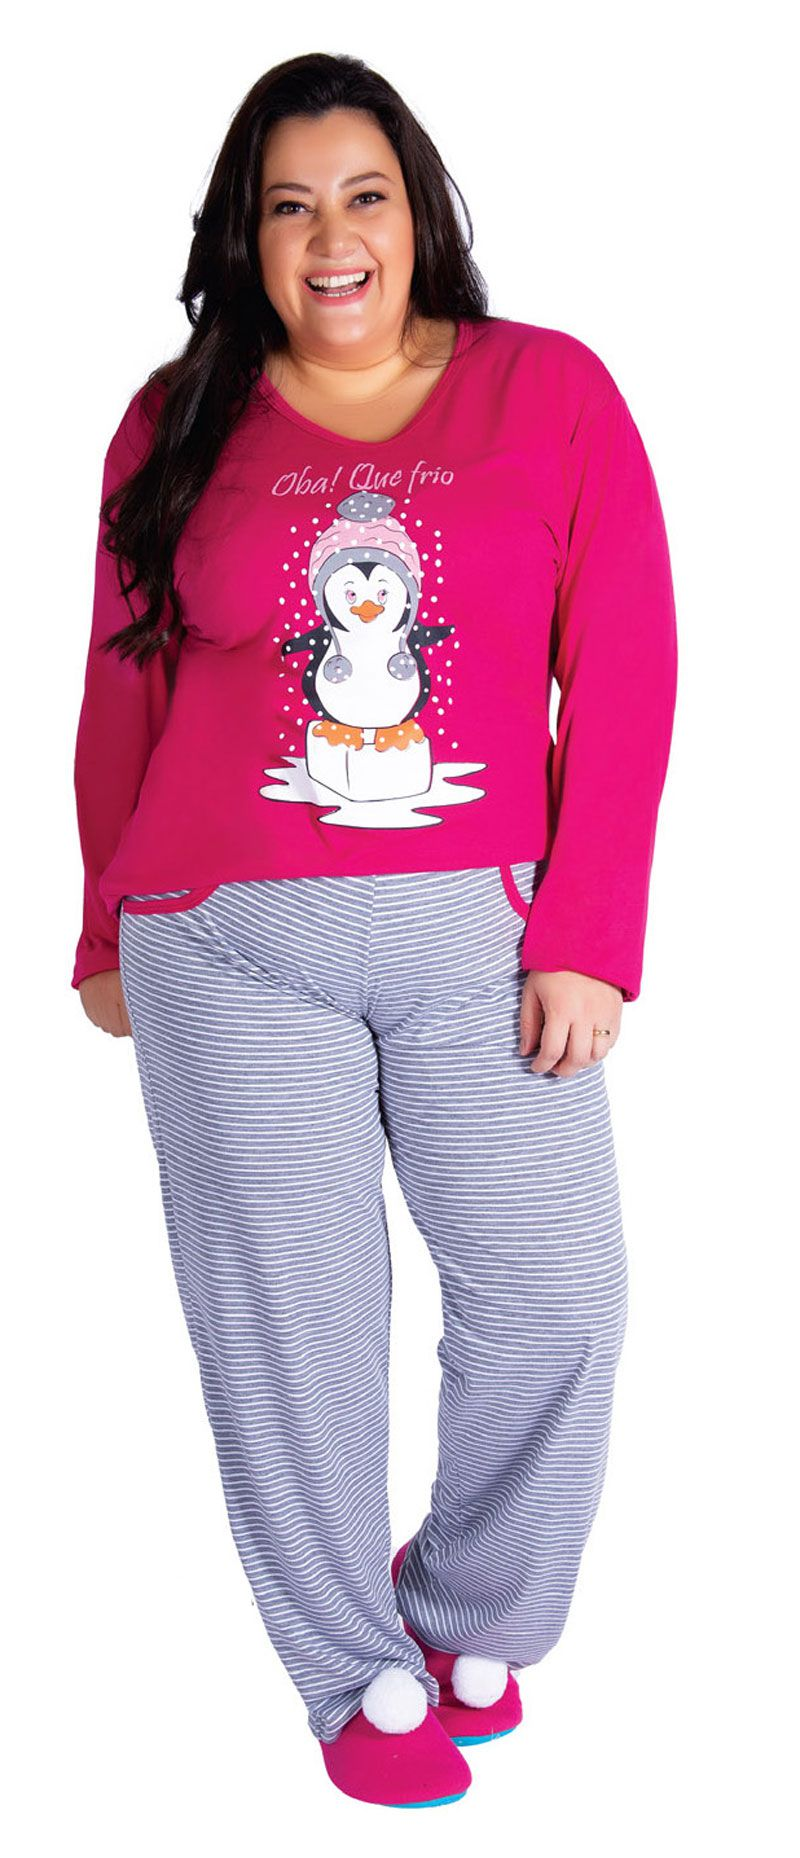 Pijama Feminino de Inverno Plus Size Meia Malha - Victory 19131